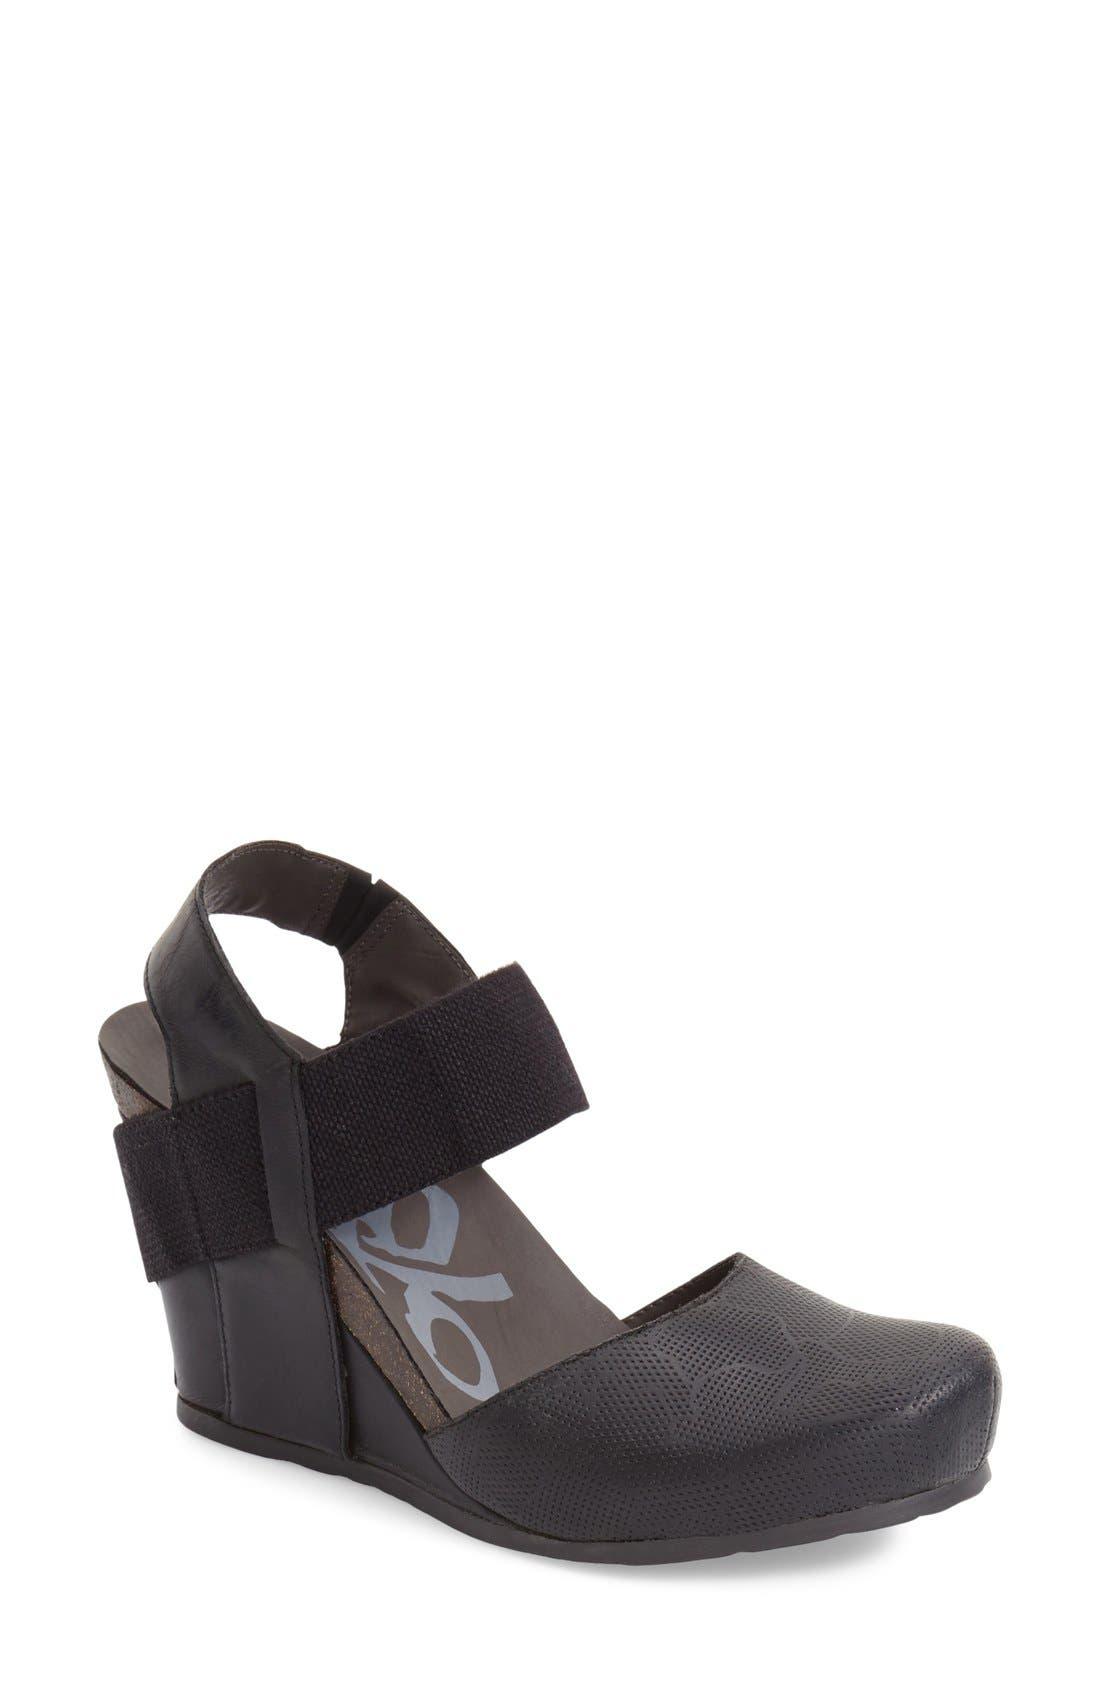 OTBT 'Rexburg' Wedge Sandal, Main, color, 019